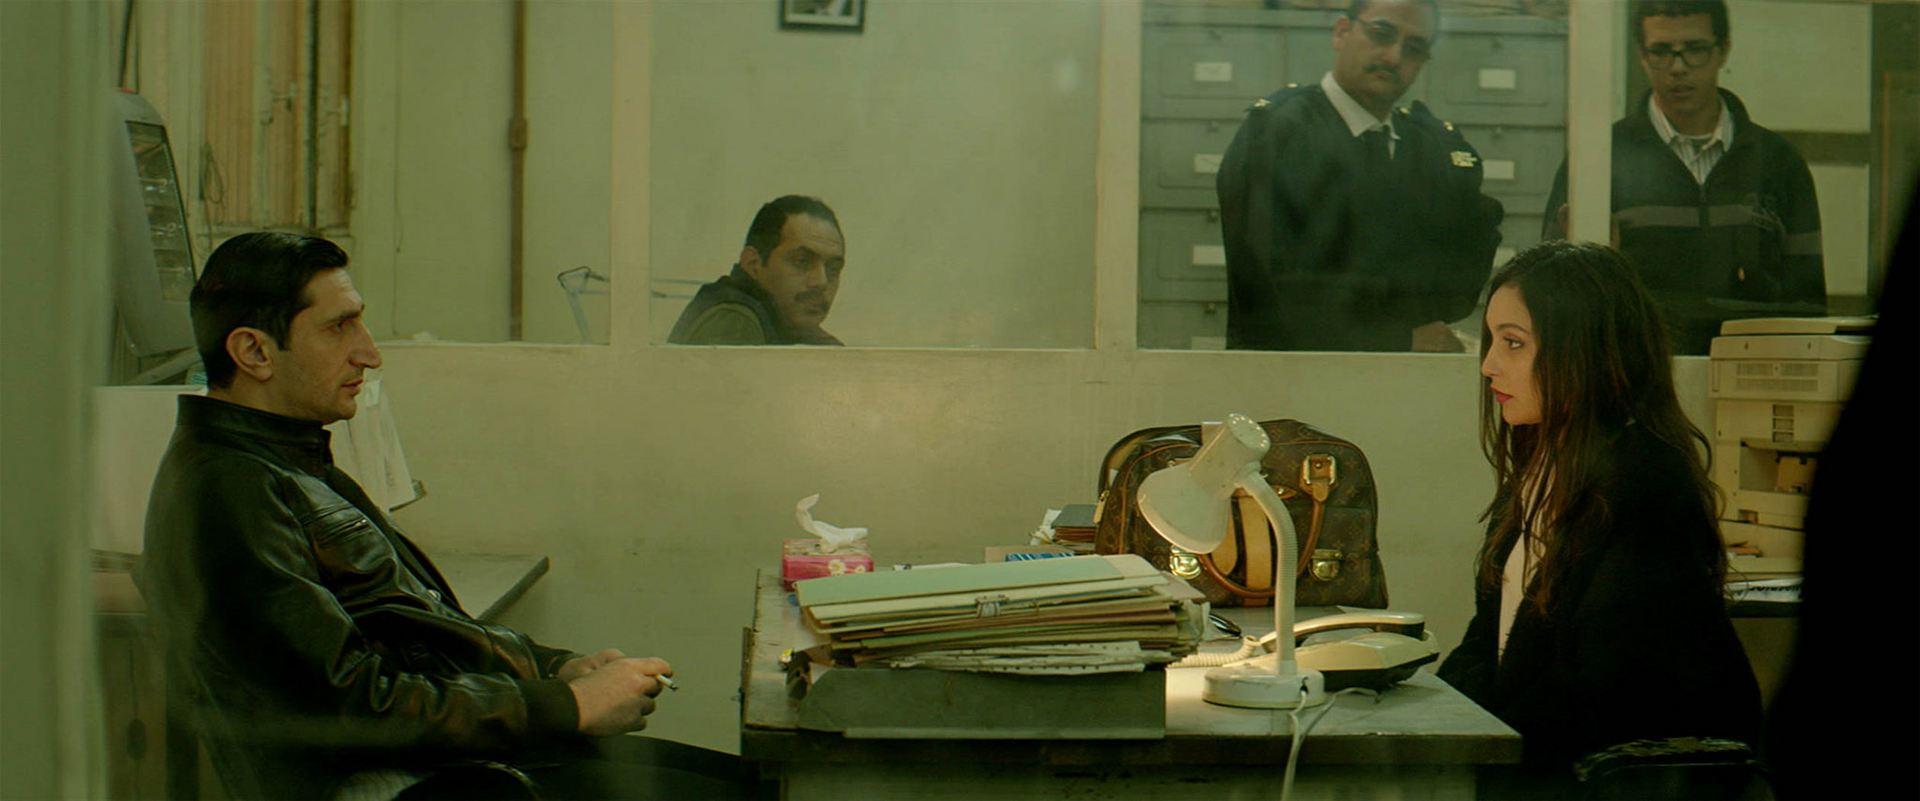 Image result for le caire confidentiel film